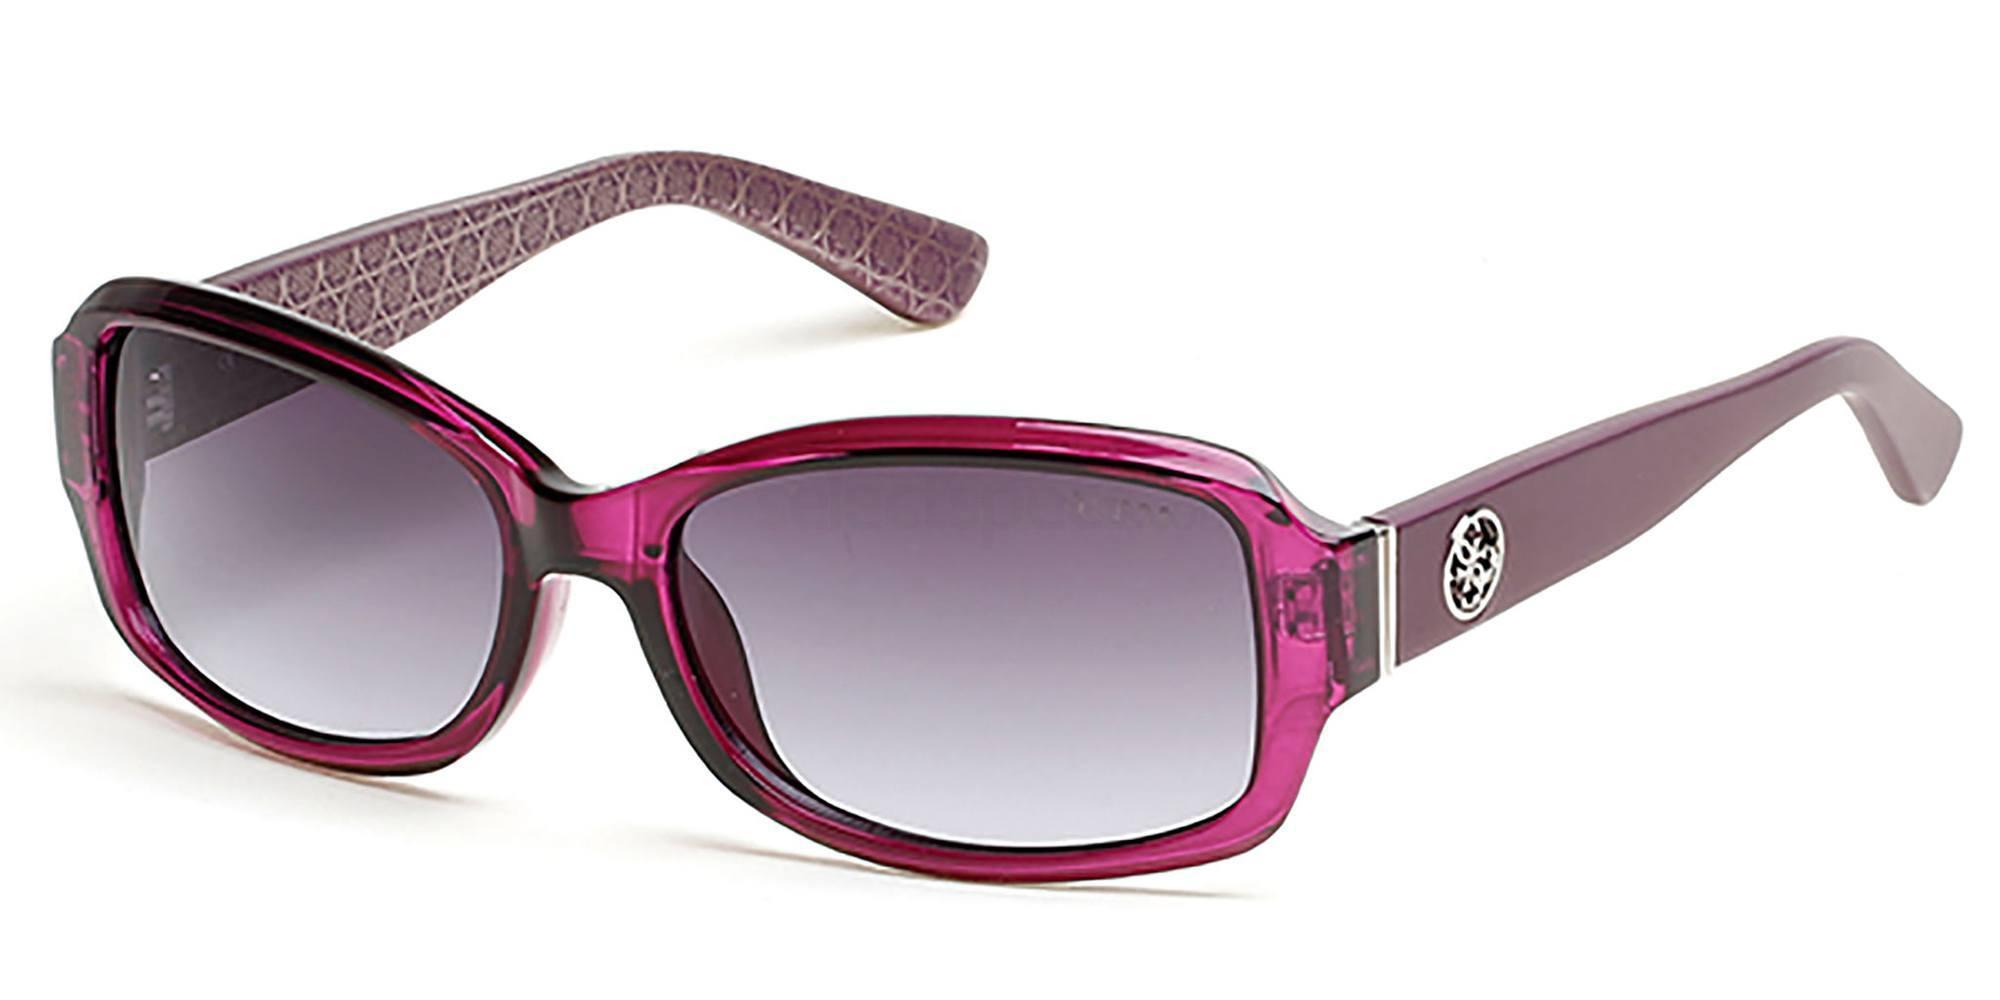 69B GU7410 Sunglasses, Guess